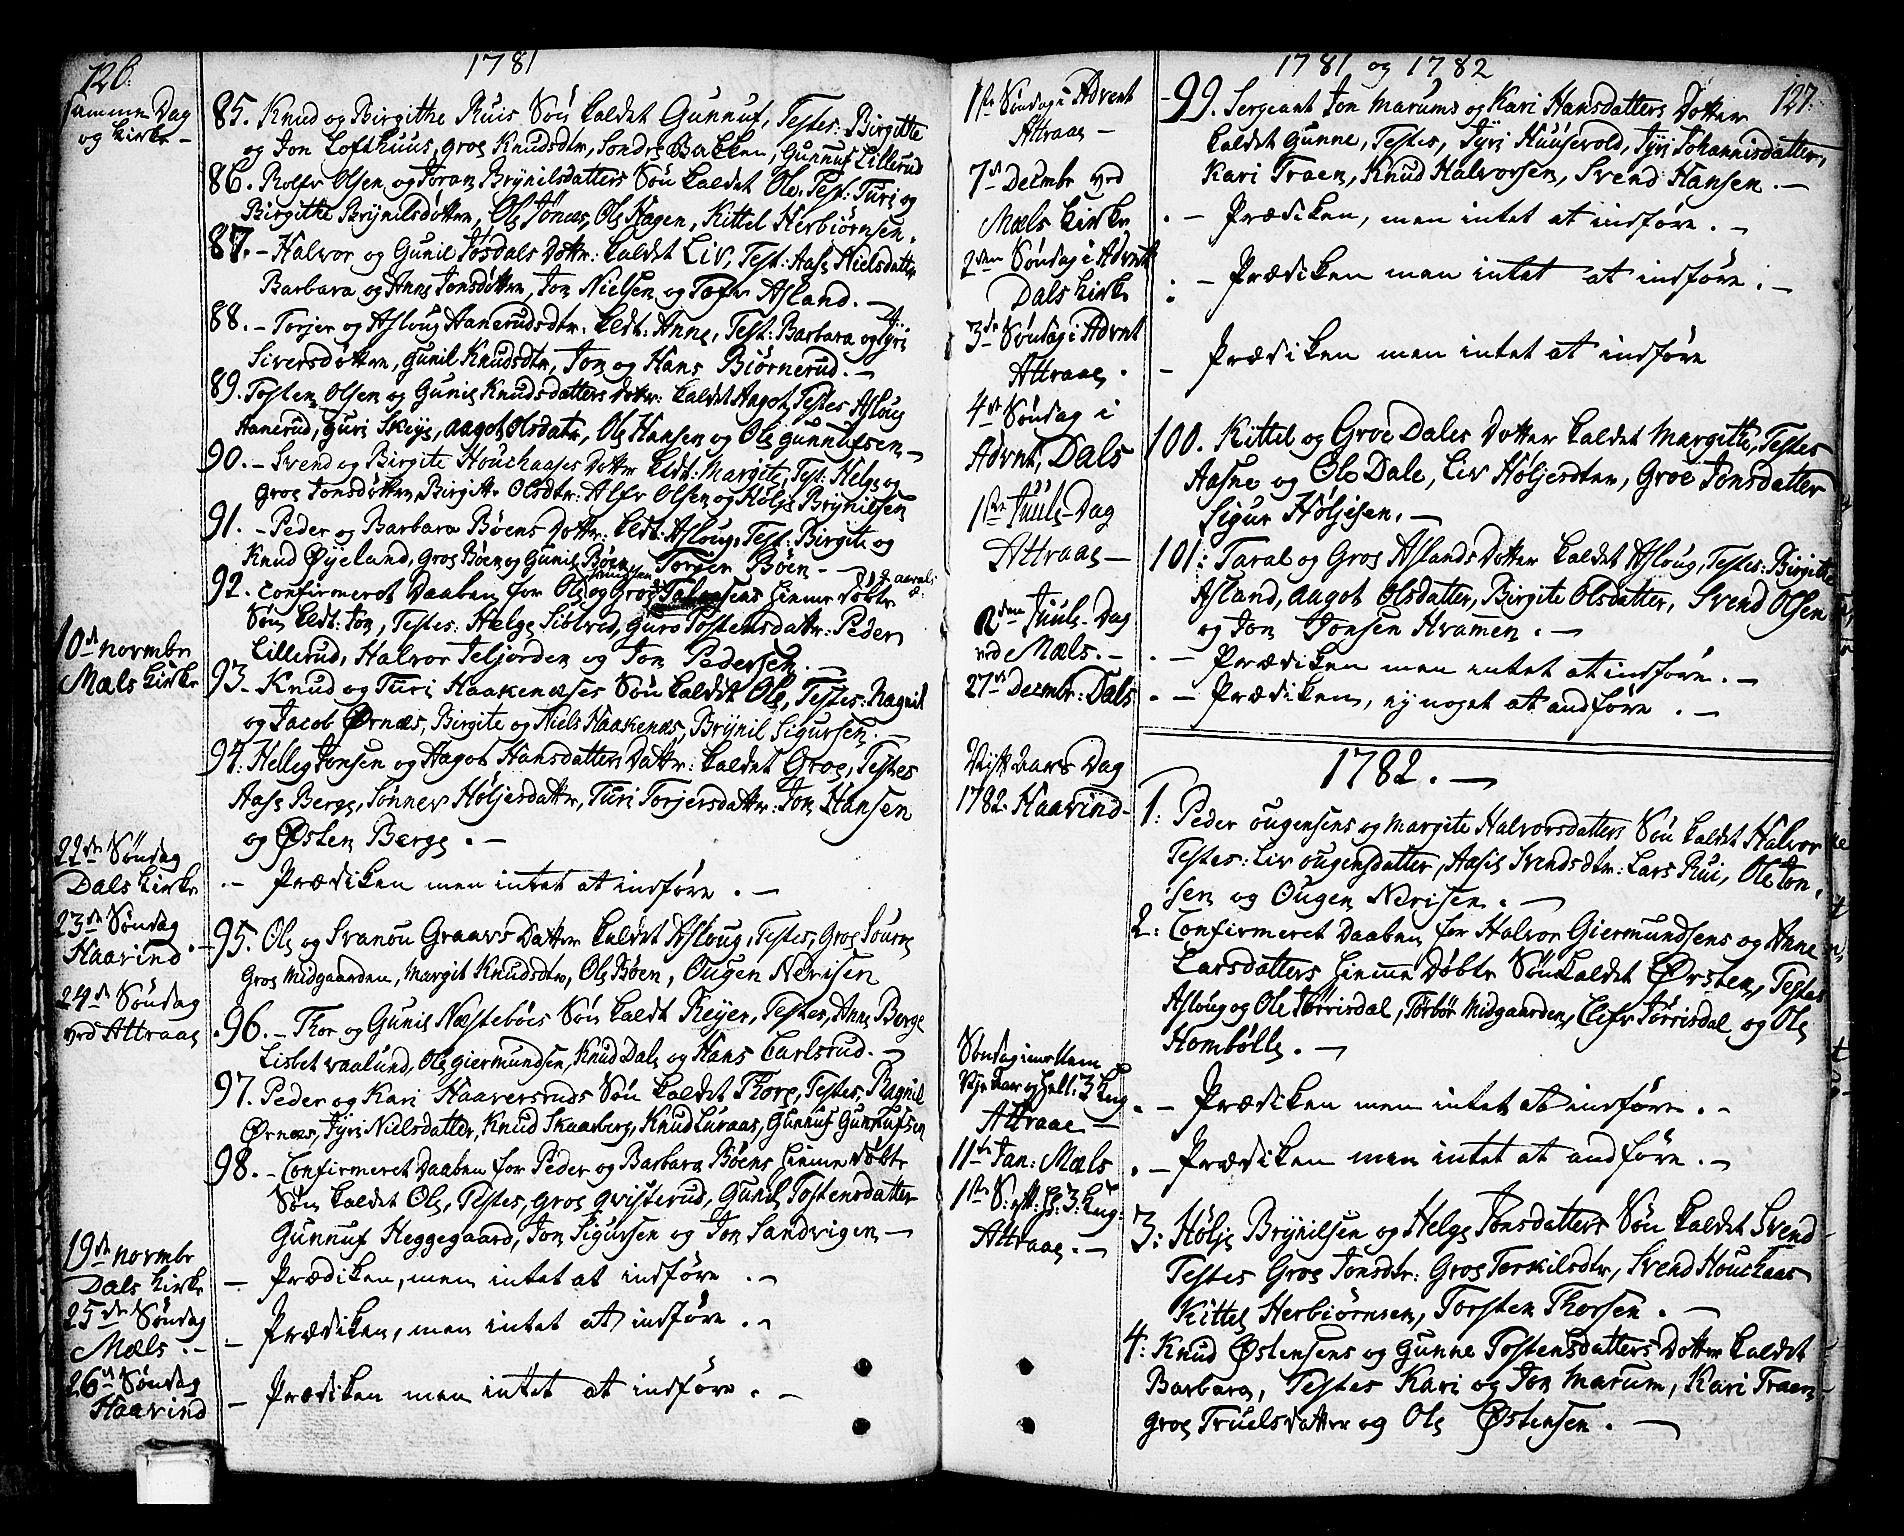 SAKO, Tinn kirkebøker, F/Fa/L0002: Ministerialbok nr. I 2, 1757-1810, s. 126-127